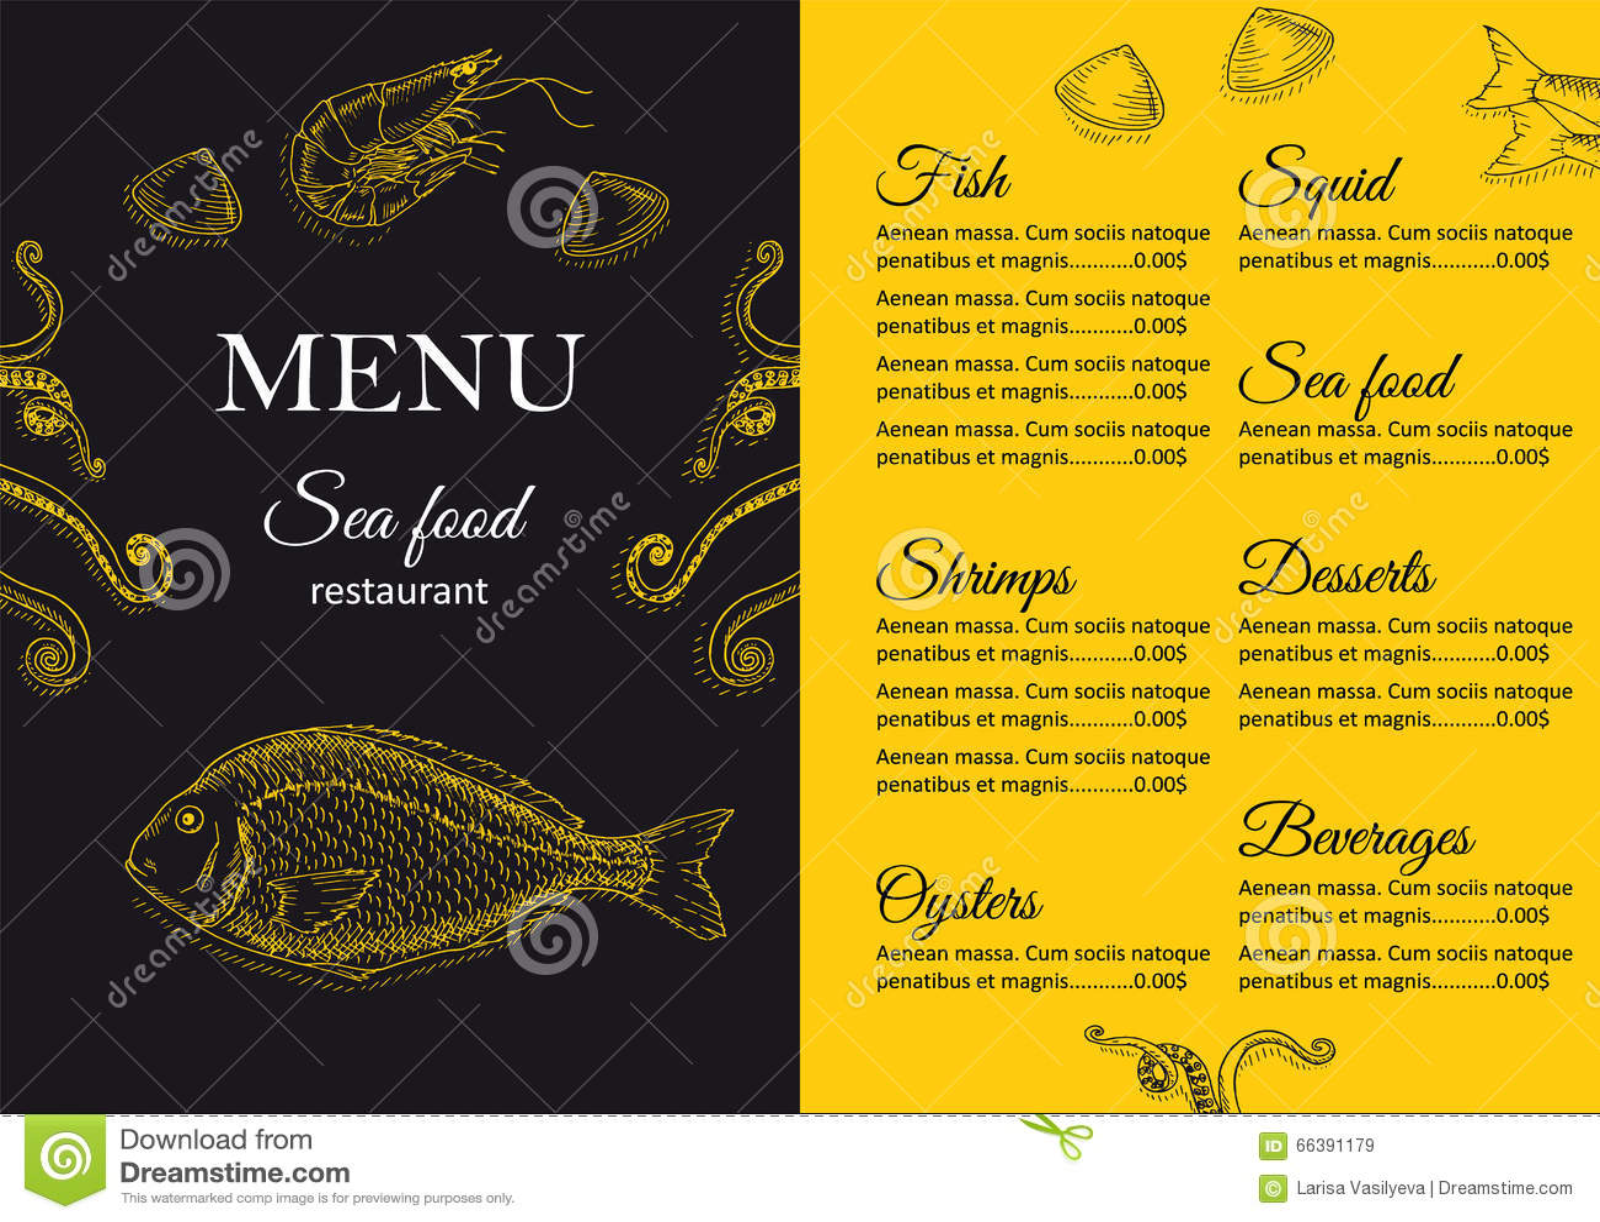 Restaurant menu design stock vector. Image of dining